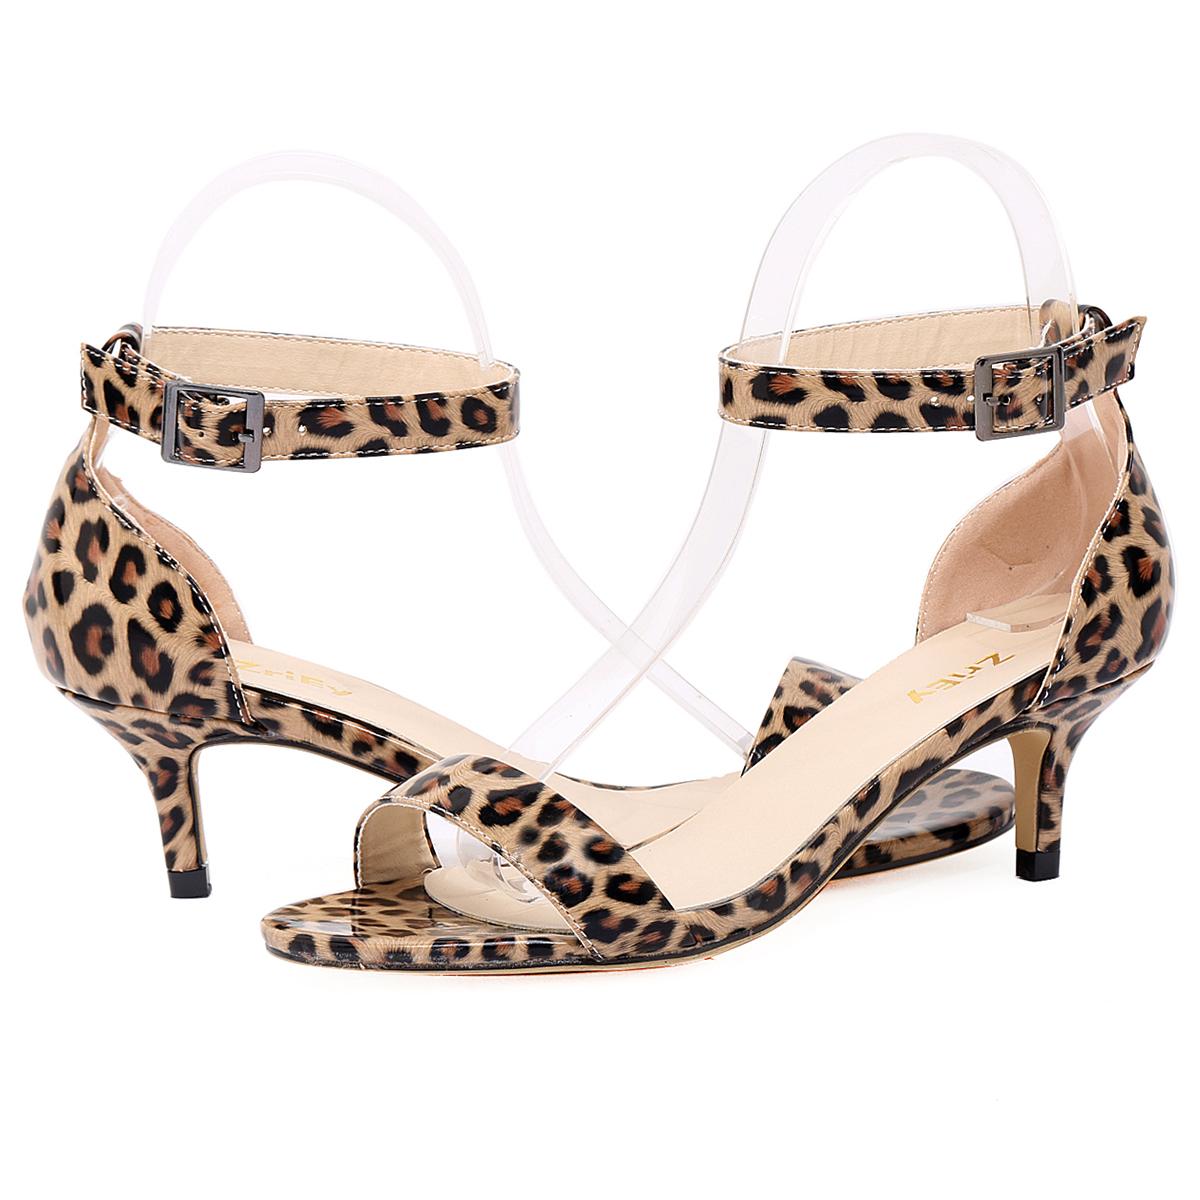 Women s Sexy Leopard Patent Leather Sandals Ankle Strap Peep Toe Low Heel  Shoes 5eccf97cda